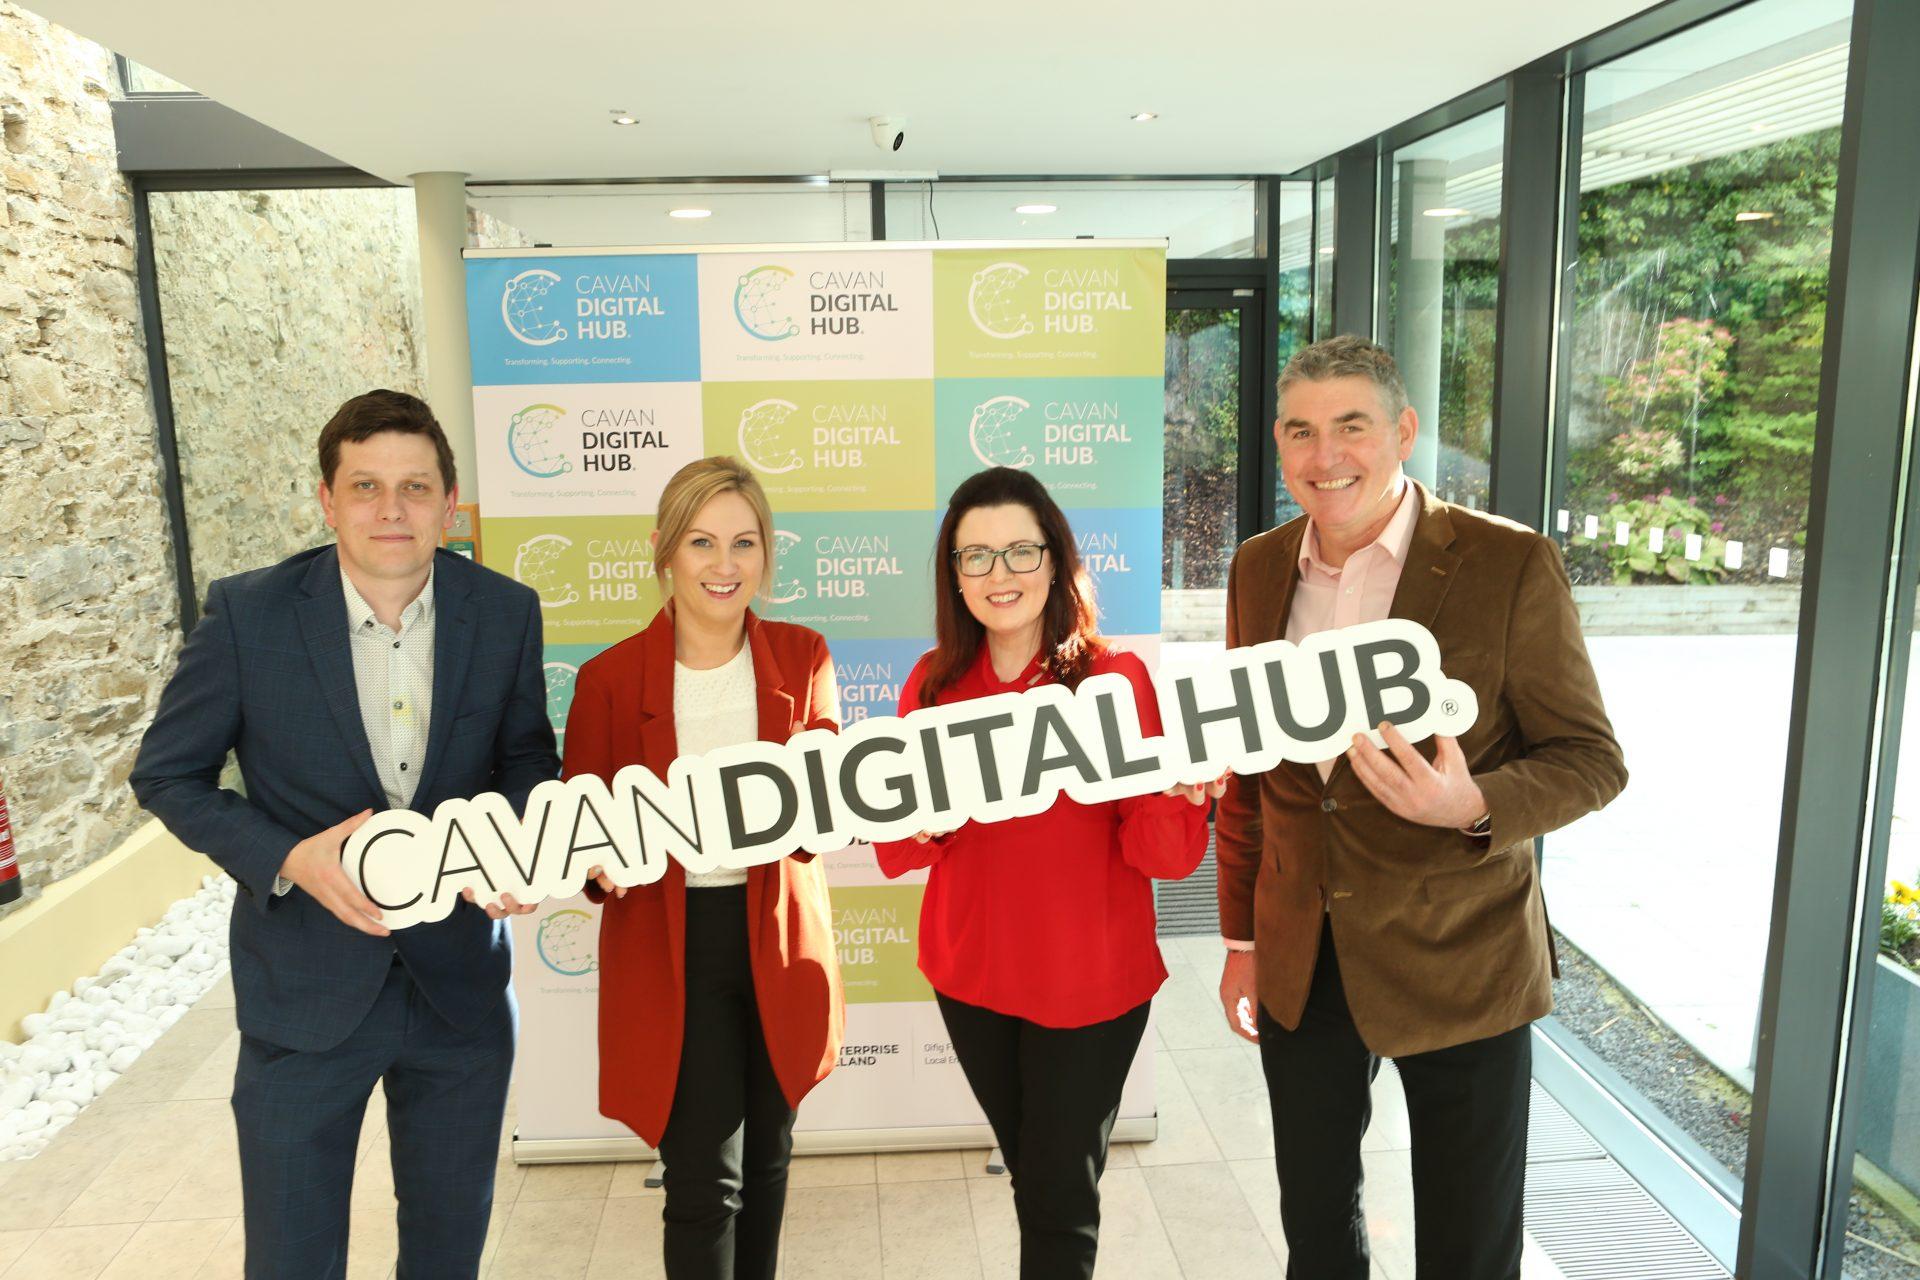 Cavan Digital Hub Becomes Ireland's Latest Gigabit Hub